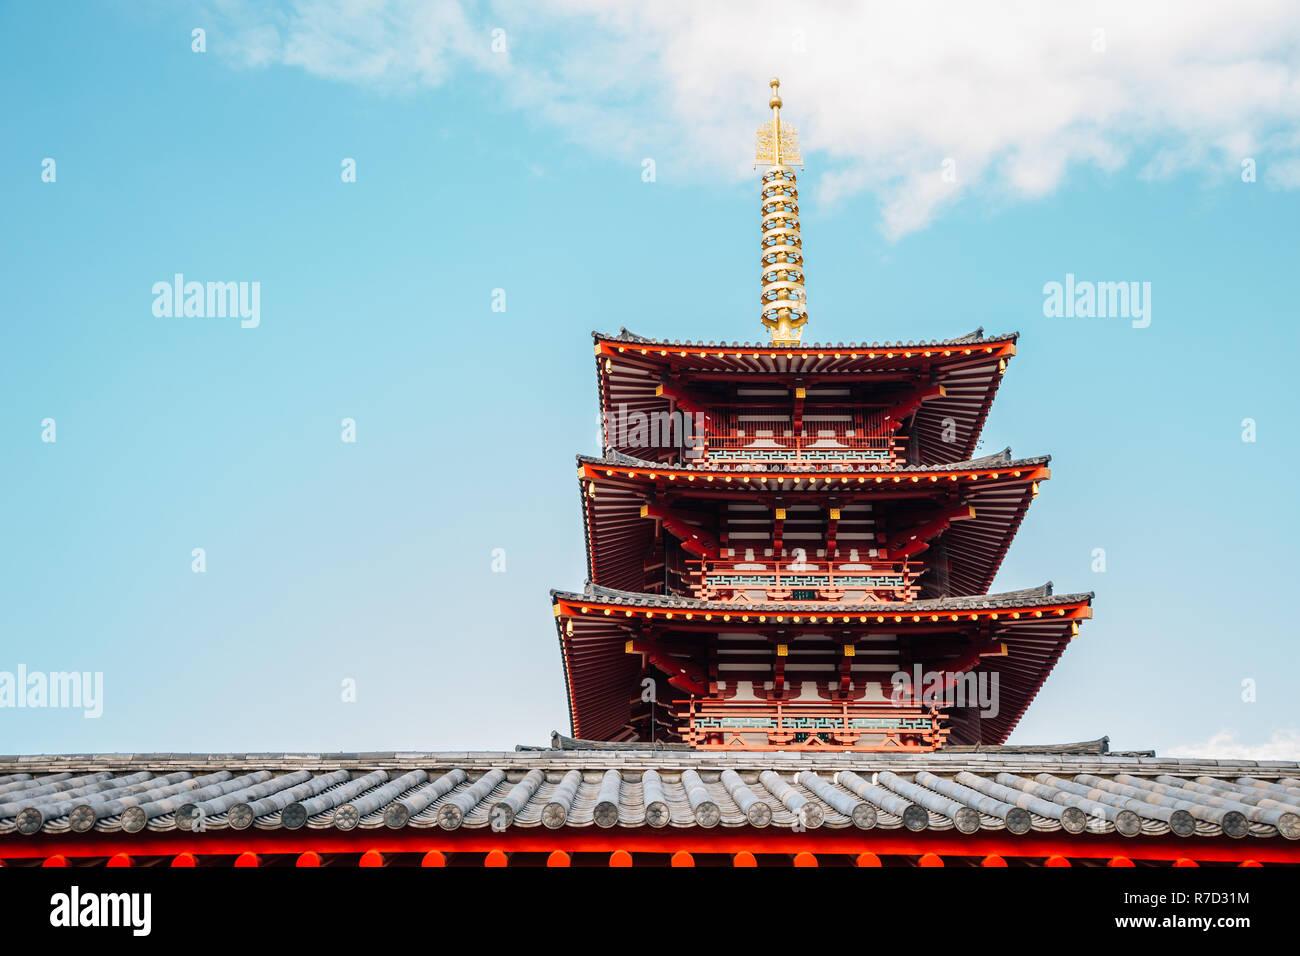 Shitennoji Temple traditional architecture in Osaka, Japan Stock Photo